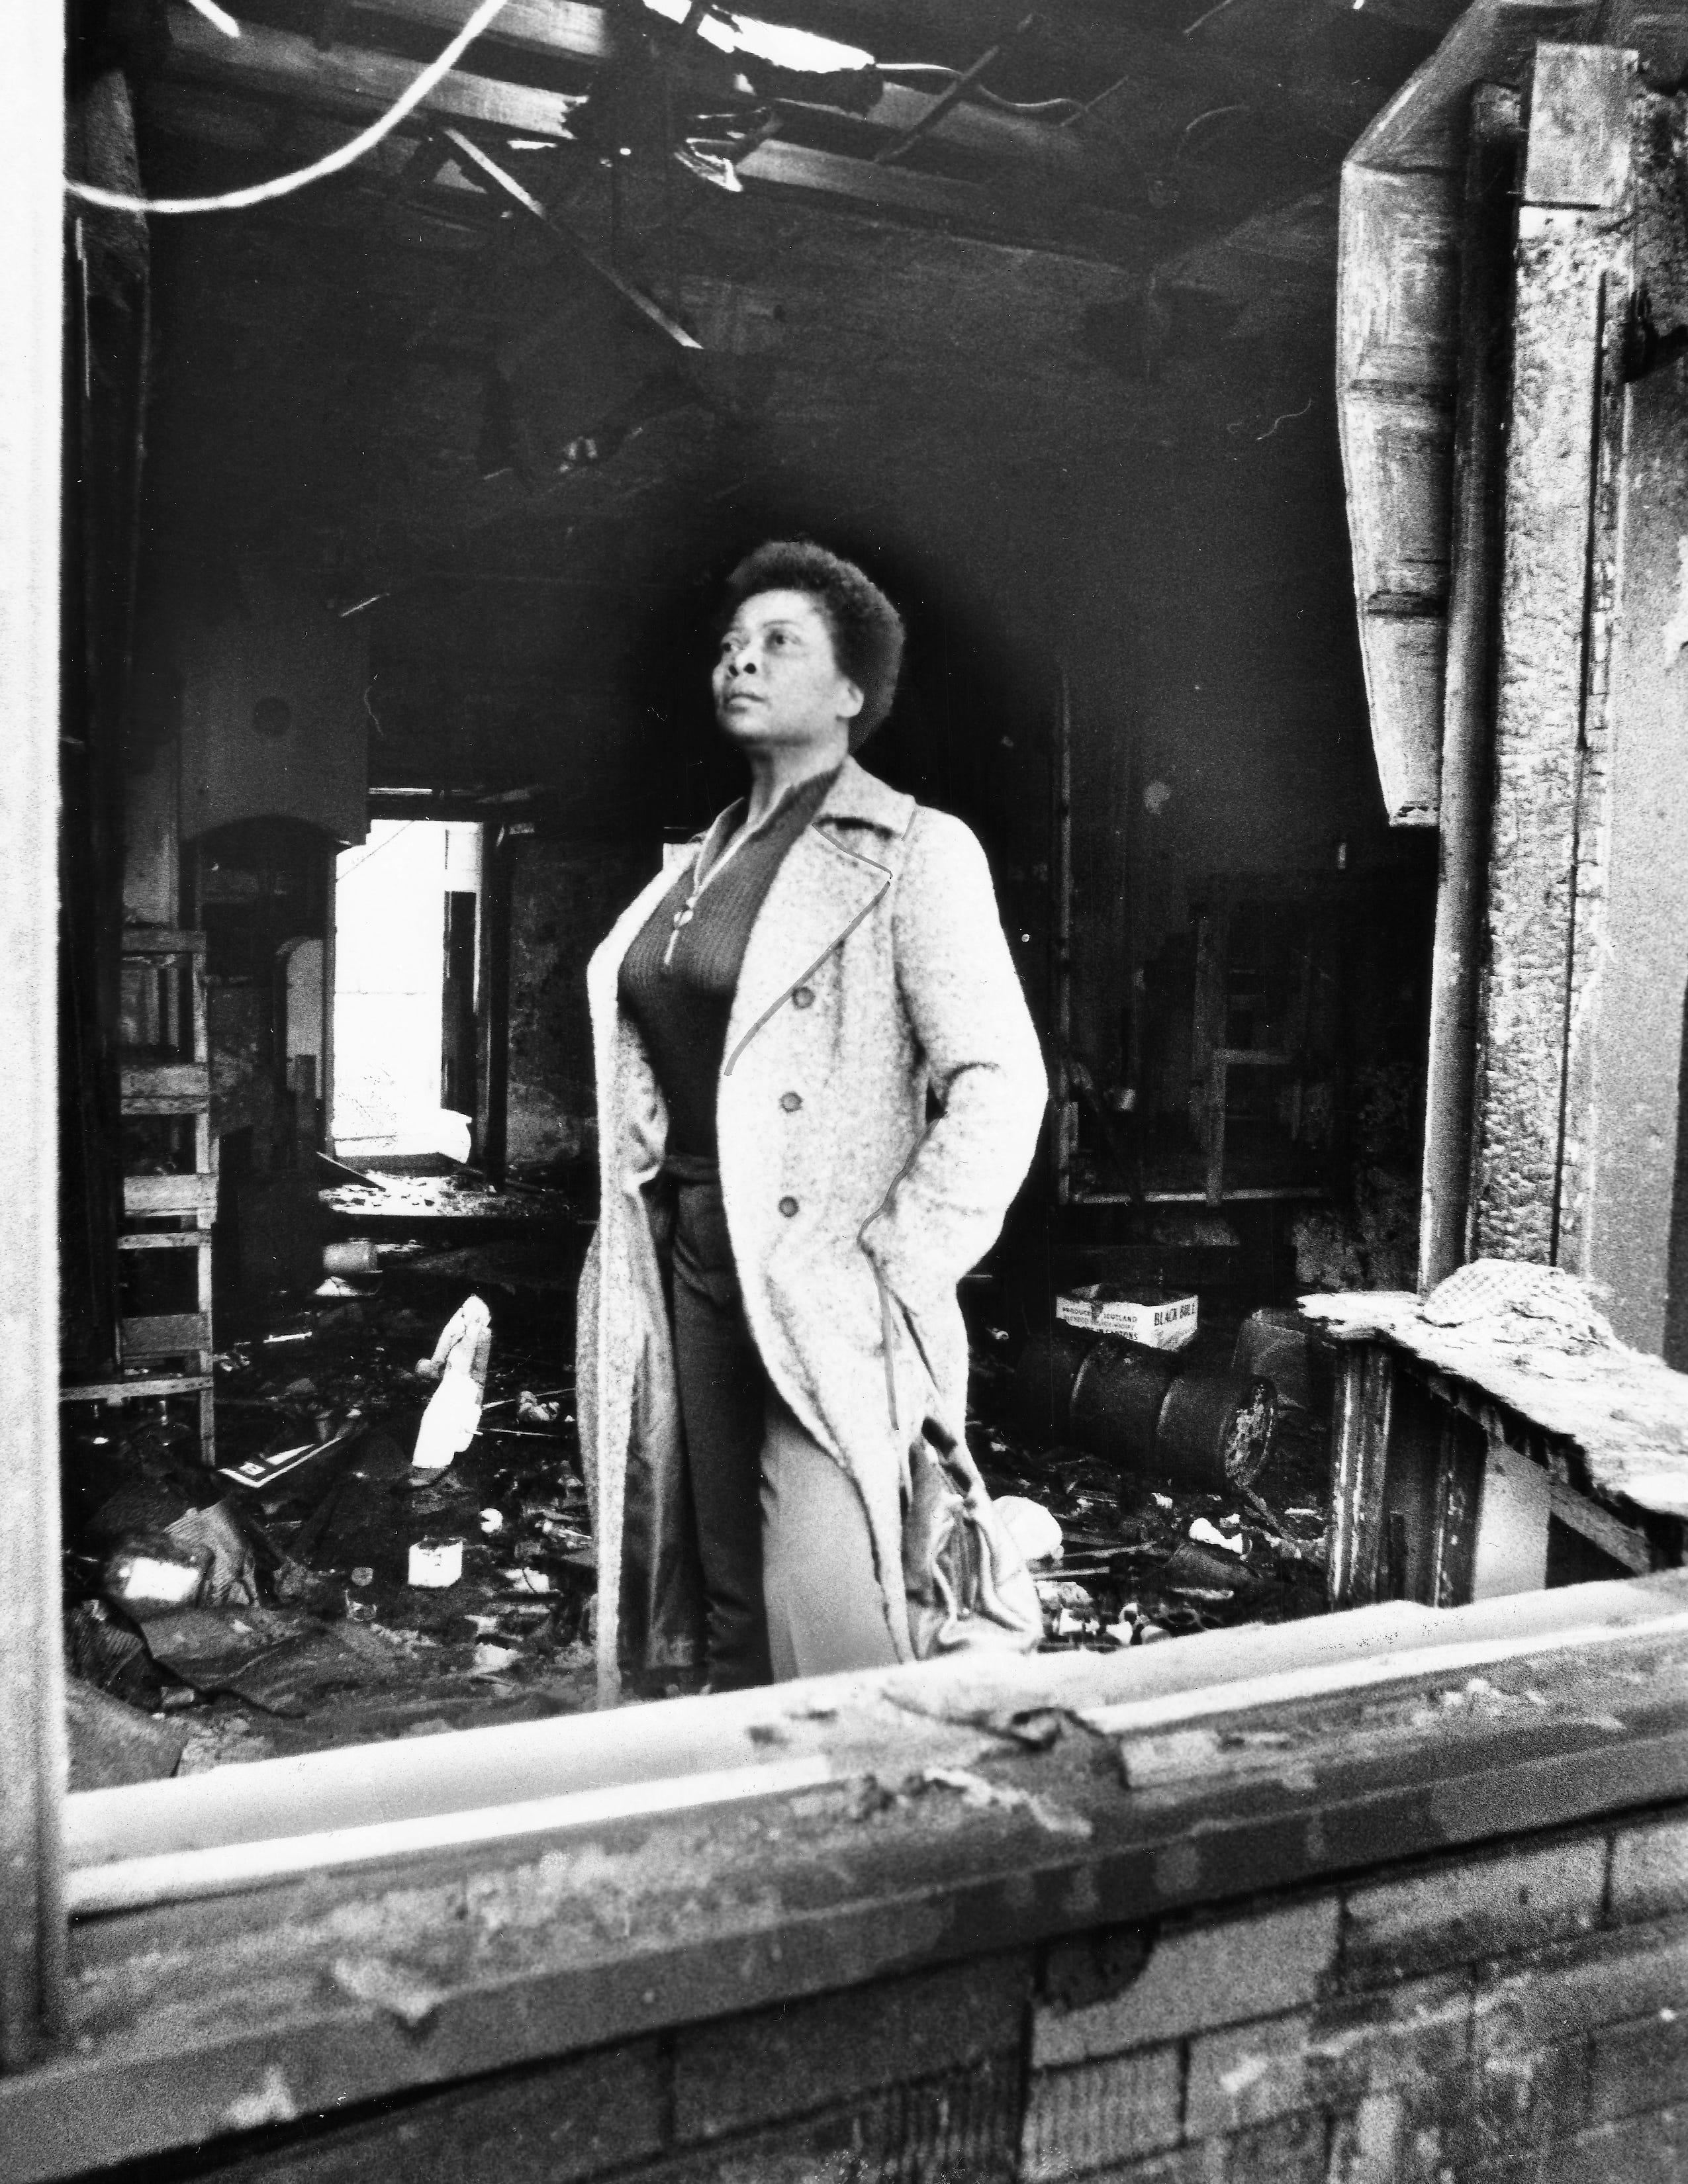 1948 : Sarah Elizabeth Ray Denied Passage to Bob-Lo Island